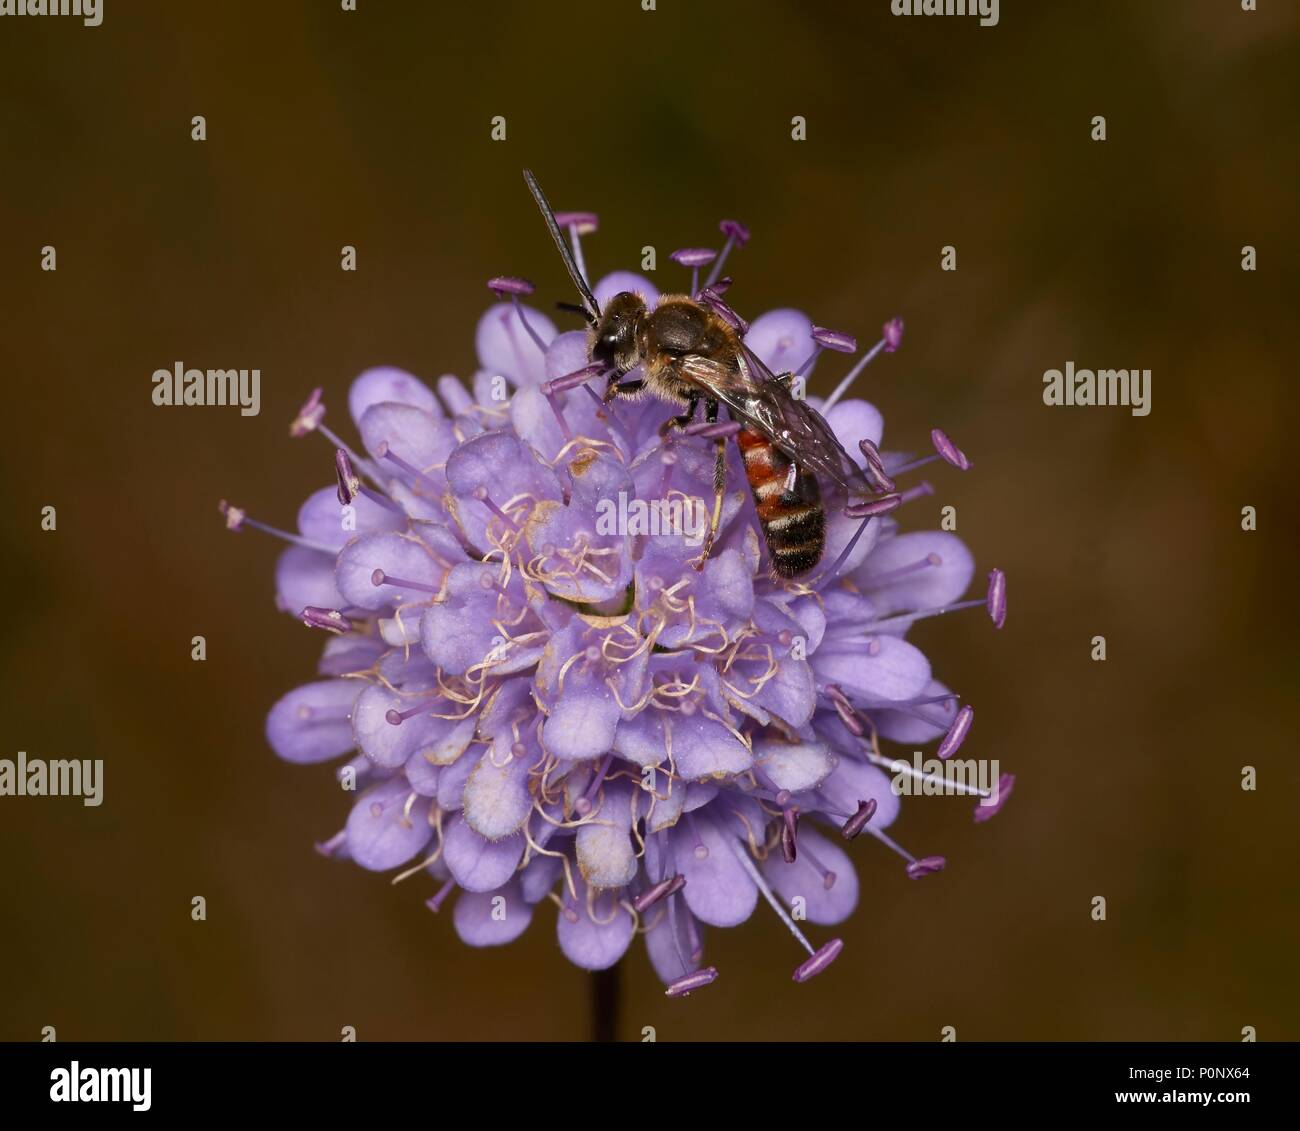 common furrow bee, Lasioglossum calceatum, male, on field scabious, Knautia arvensis, Shropshire, England, UK - Stock Image